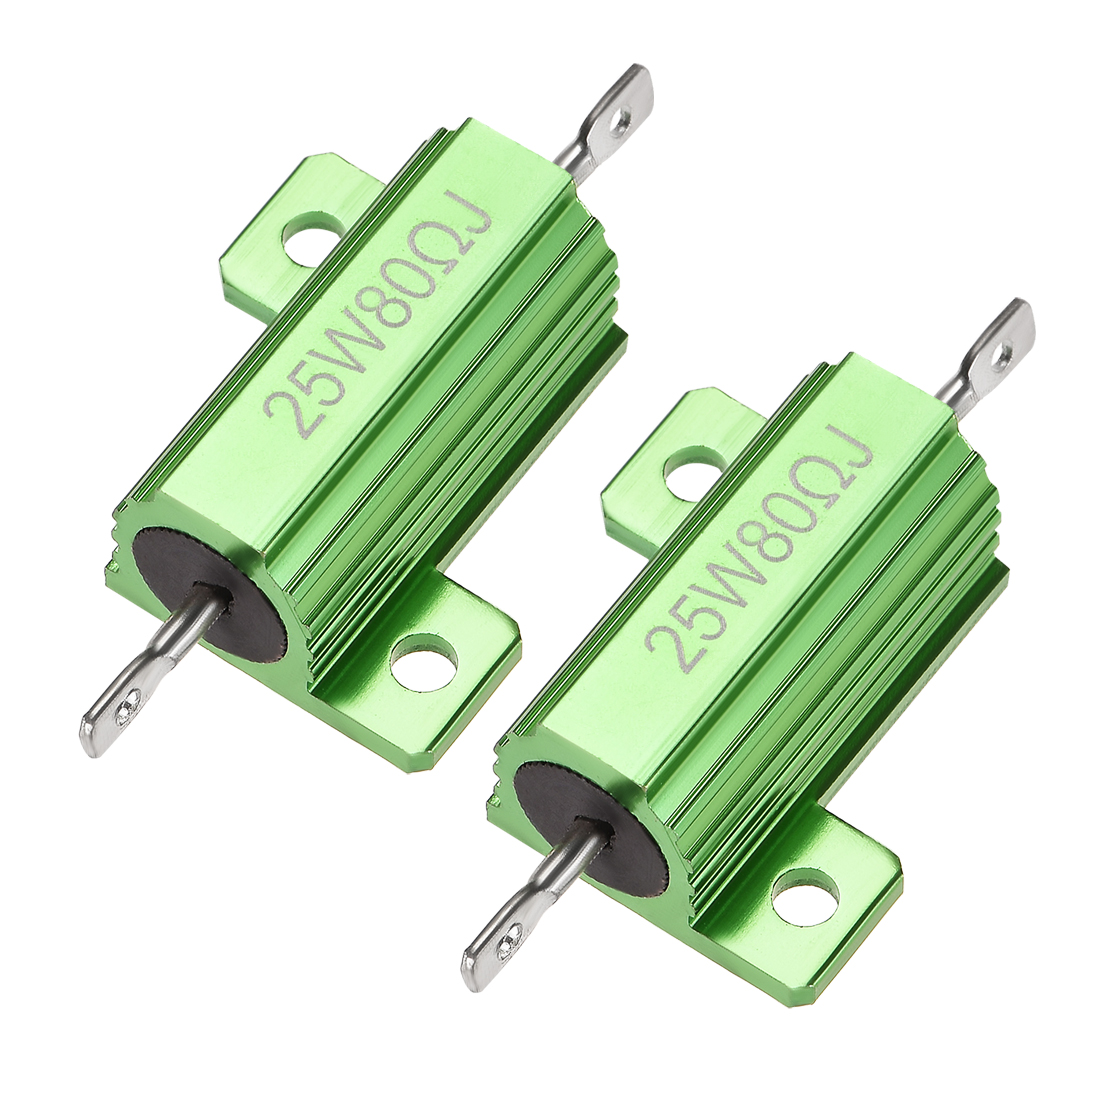 25W 80 Ohm 5% Aluminum Housing Resistor Wirewound Resistor Green Tone 2 Pcs